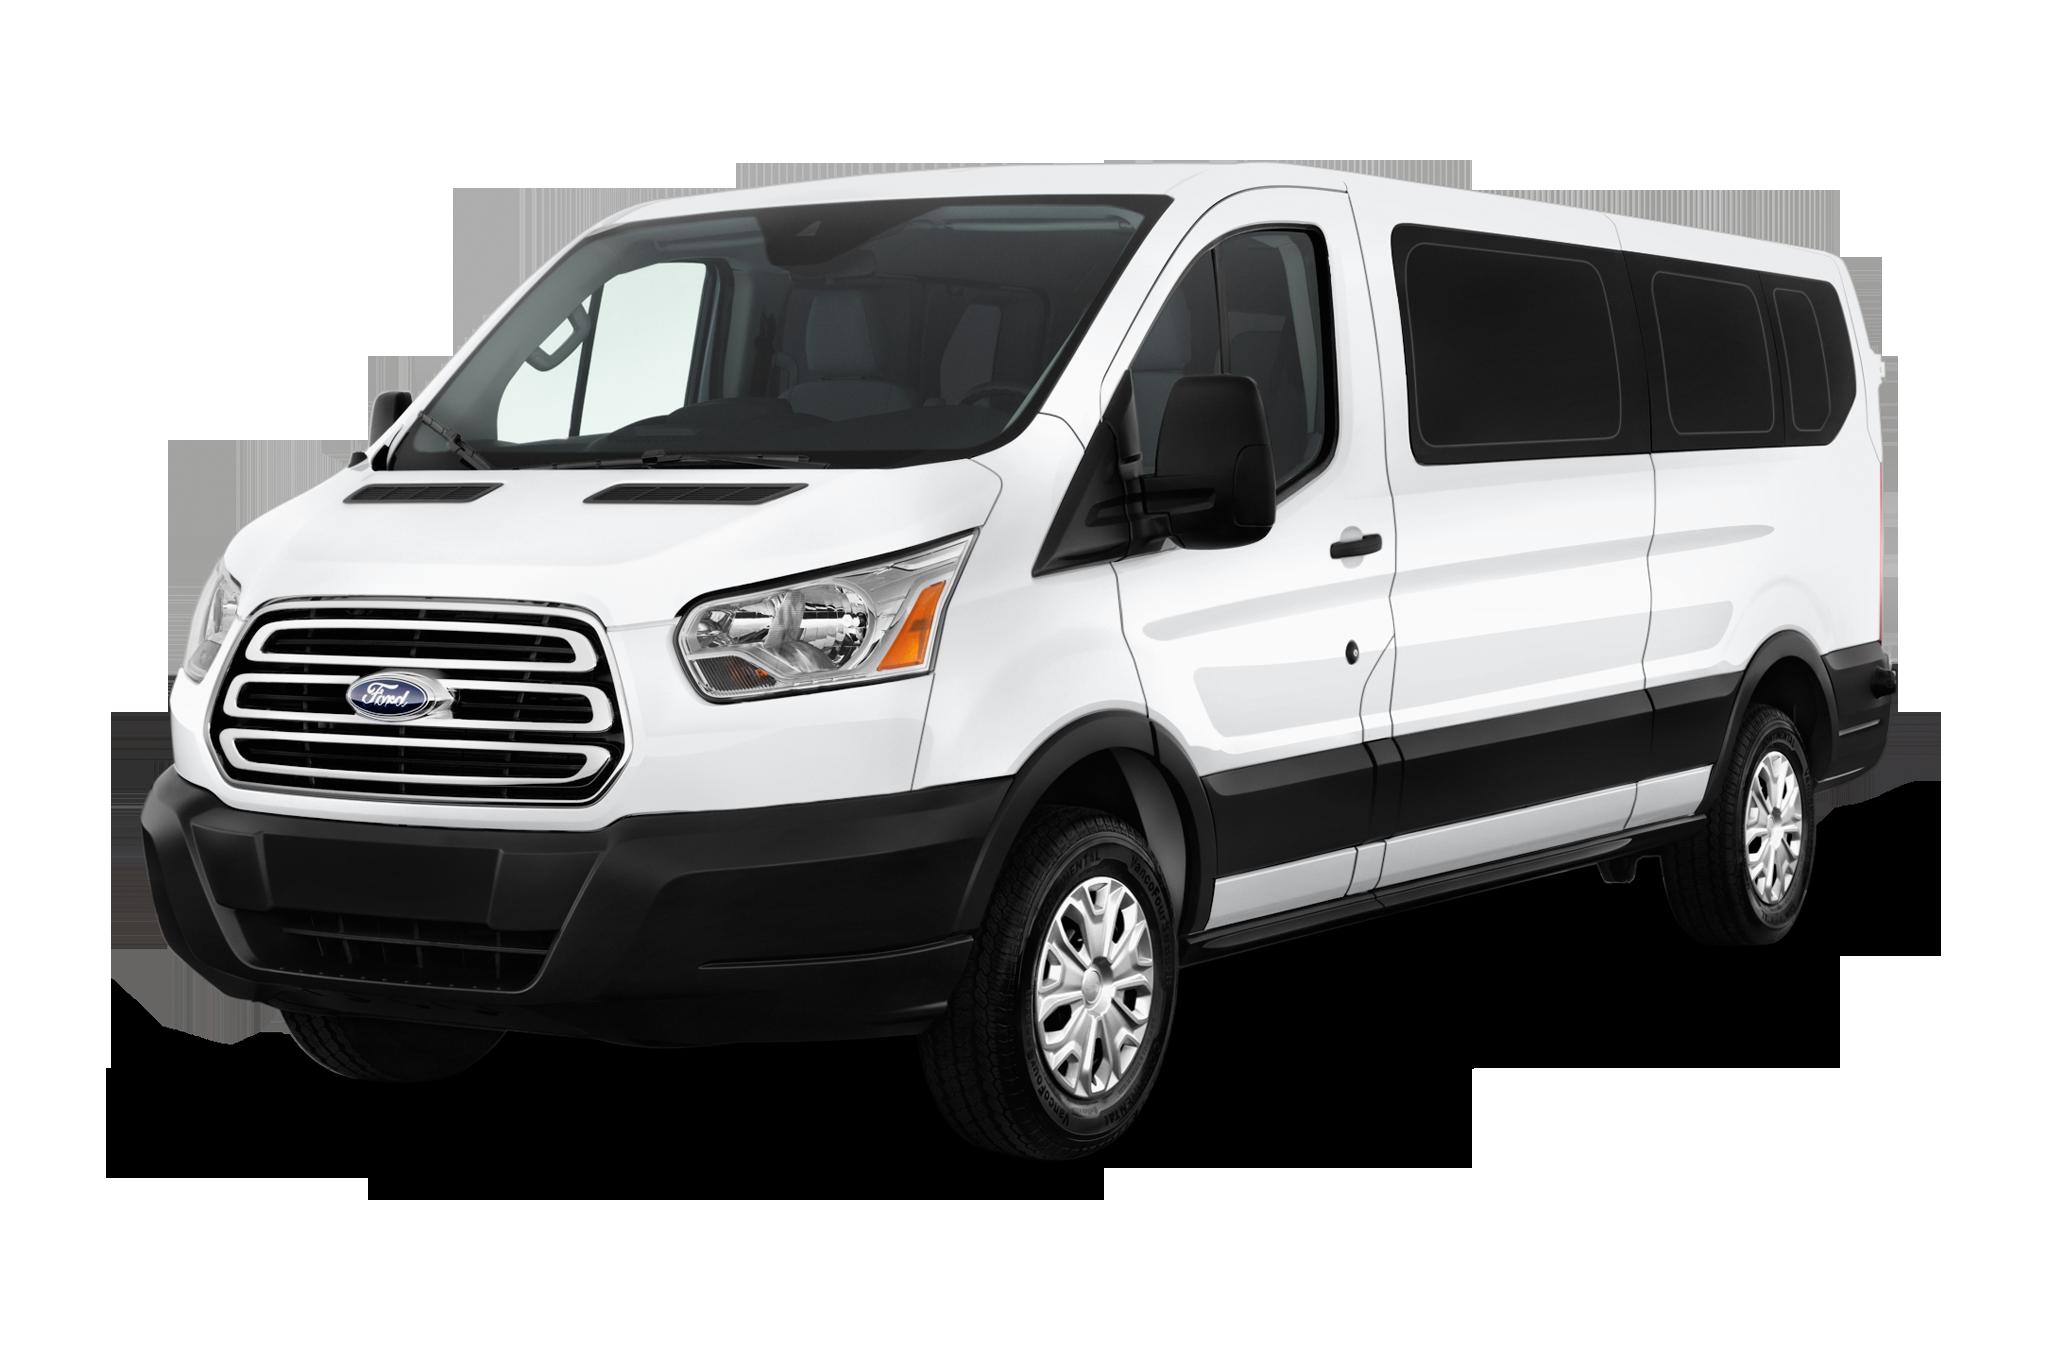 ford transit review. Minivan clipart van cargo